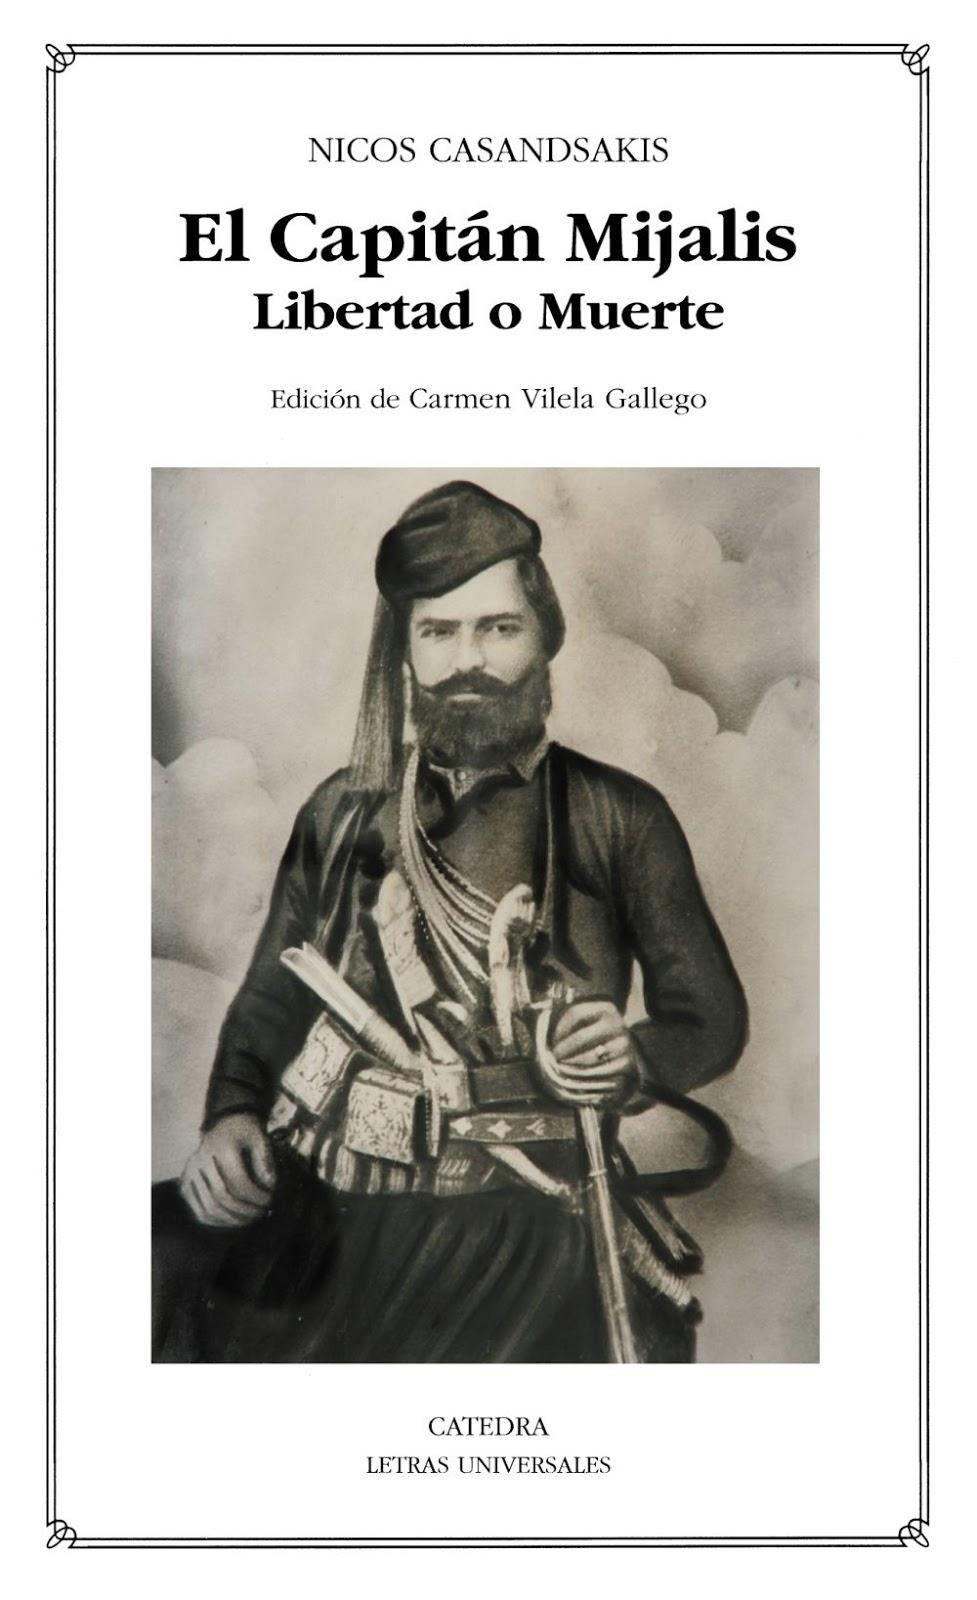 El capitán Mijalis